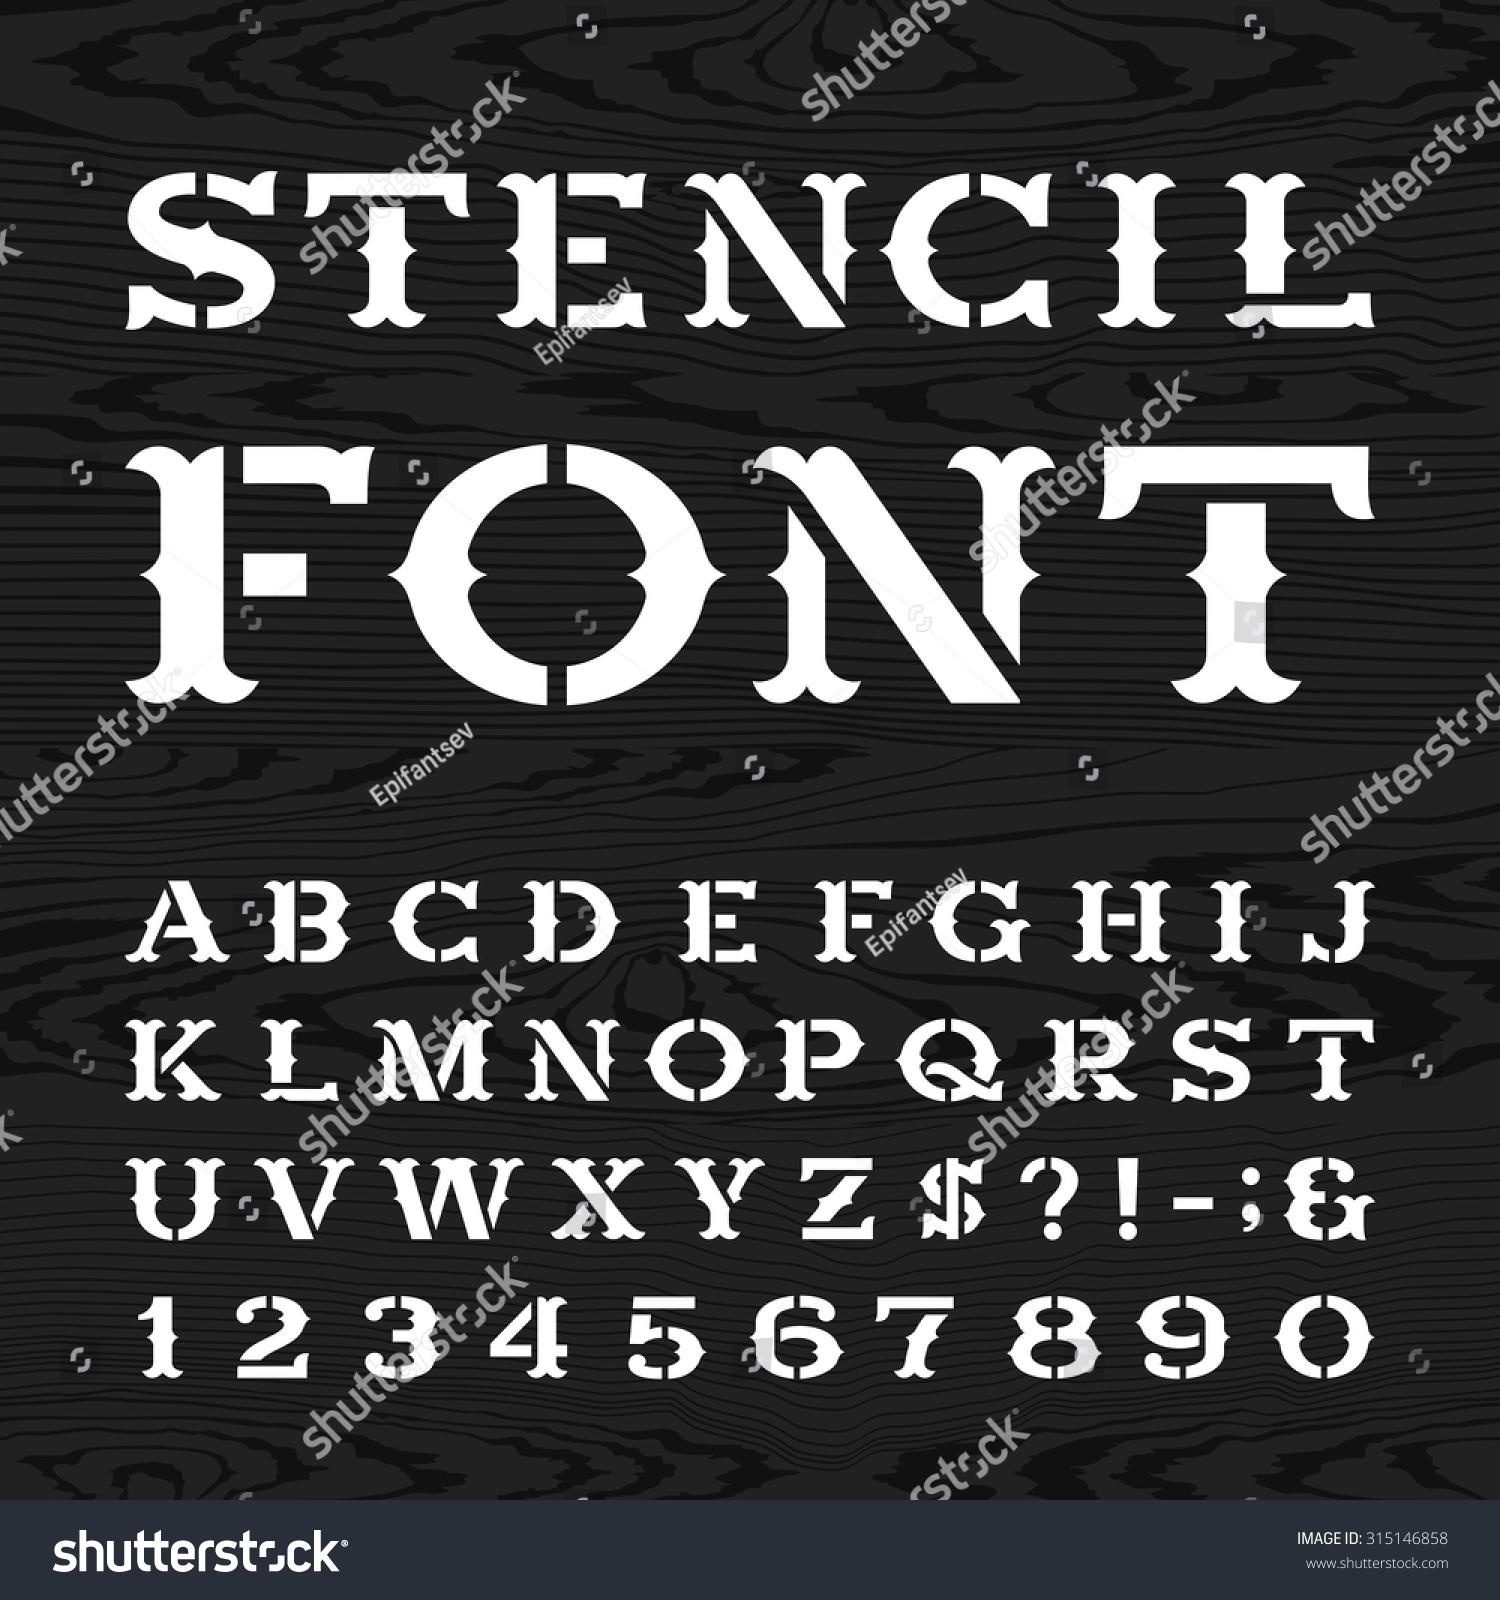 Western Style Retro Alphabet Stencil Font Stock Vector